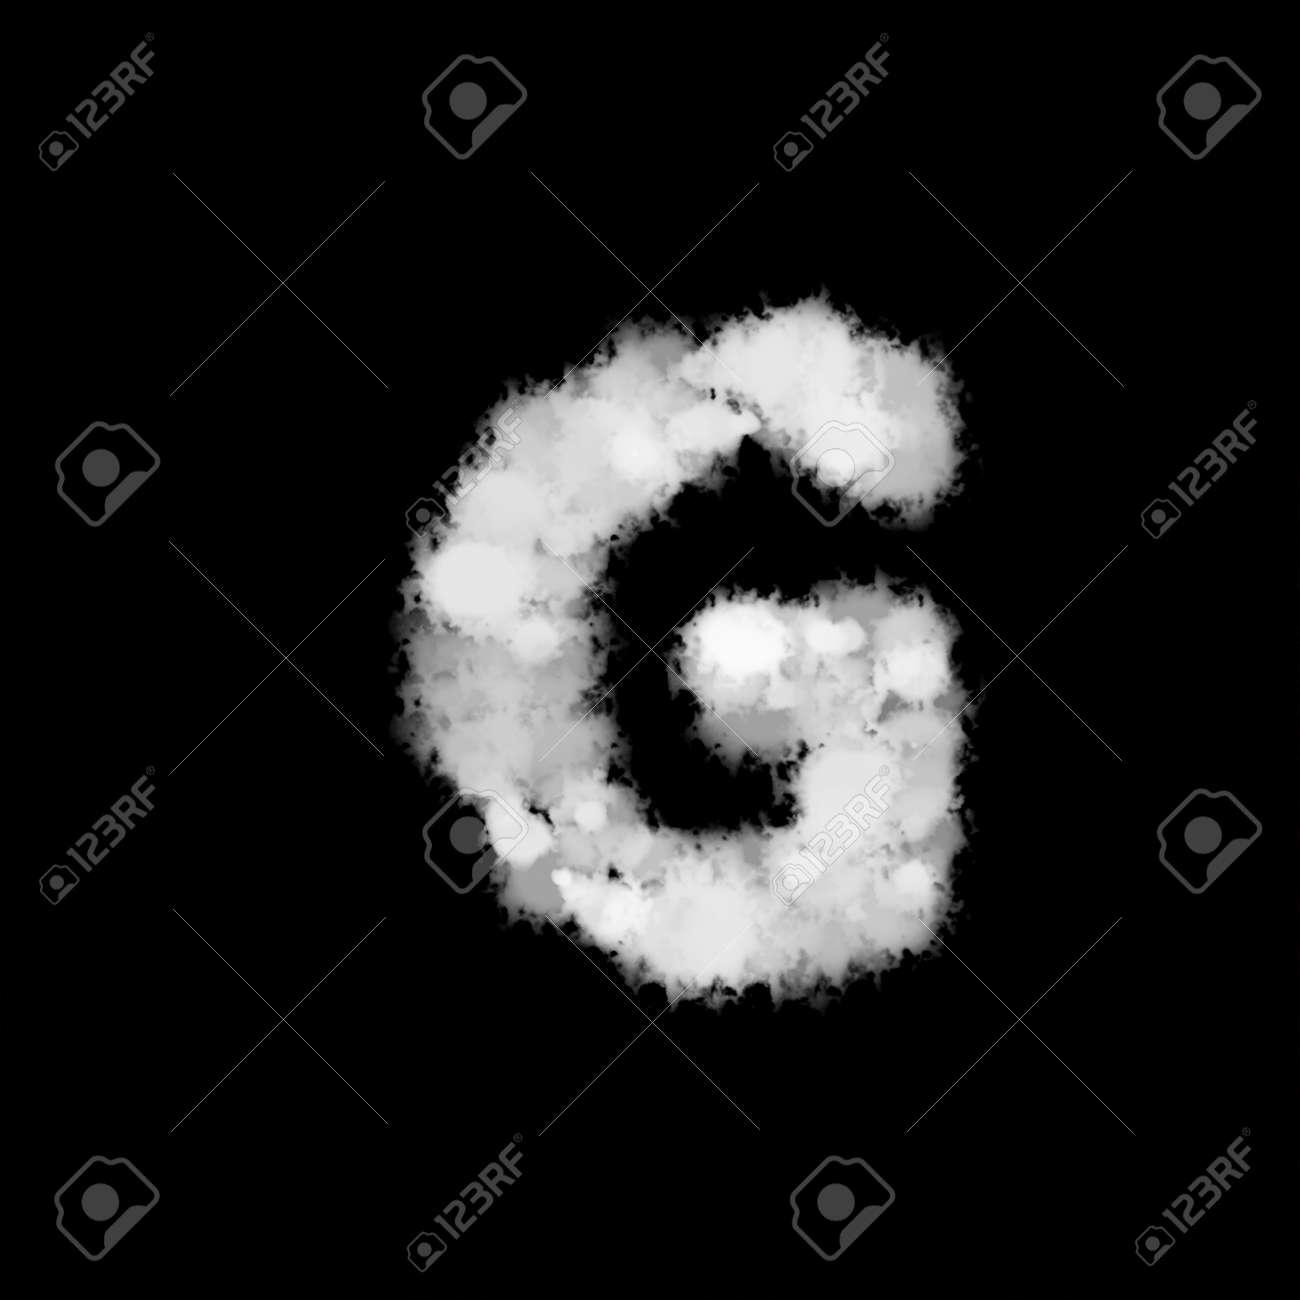 fog mist or smoke forming letter G, English alphabet text font character on black background. illustration - 171931355